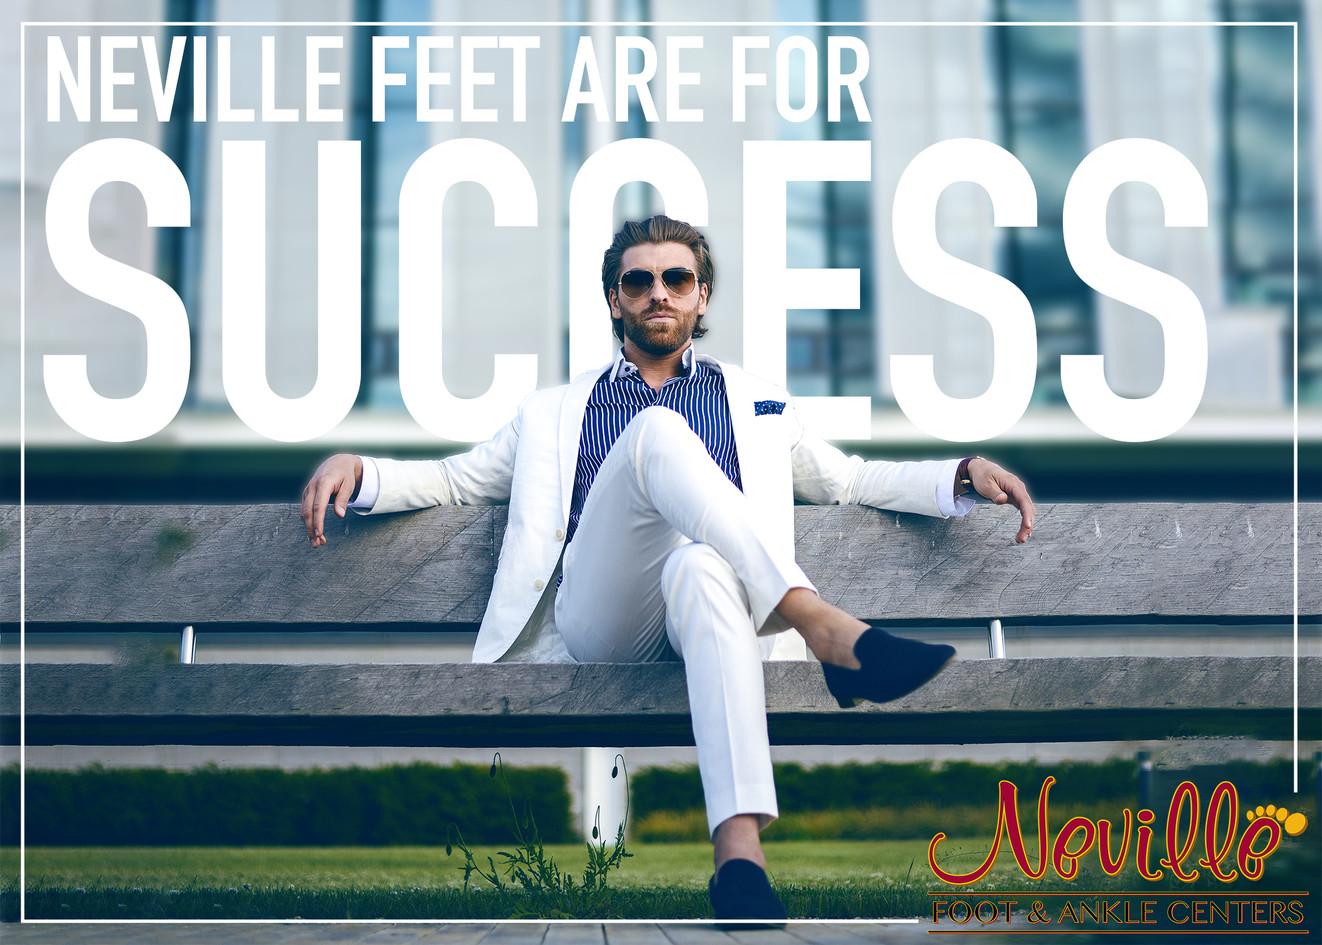 SUCCESS NEVILLE